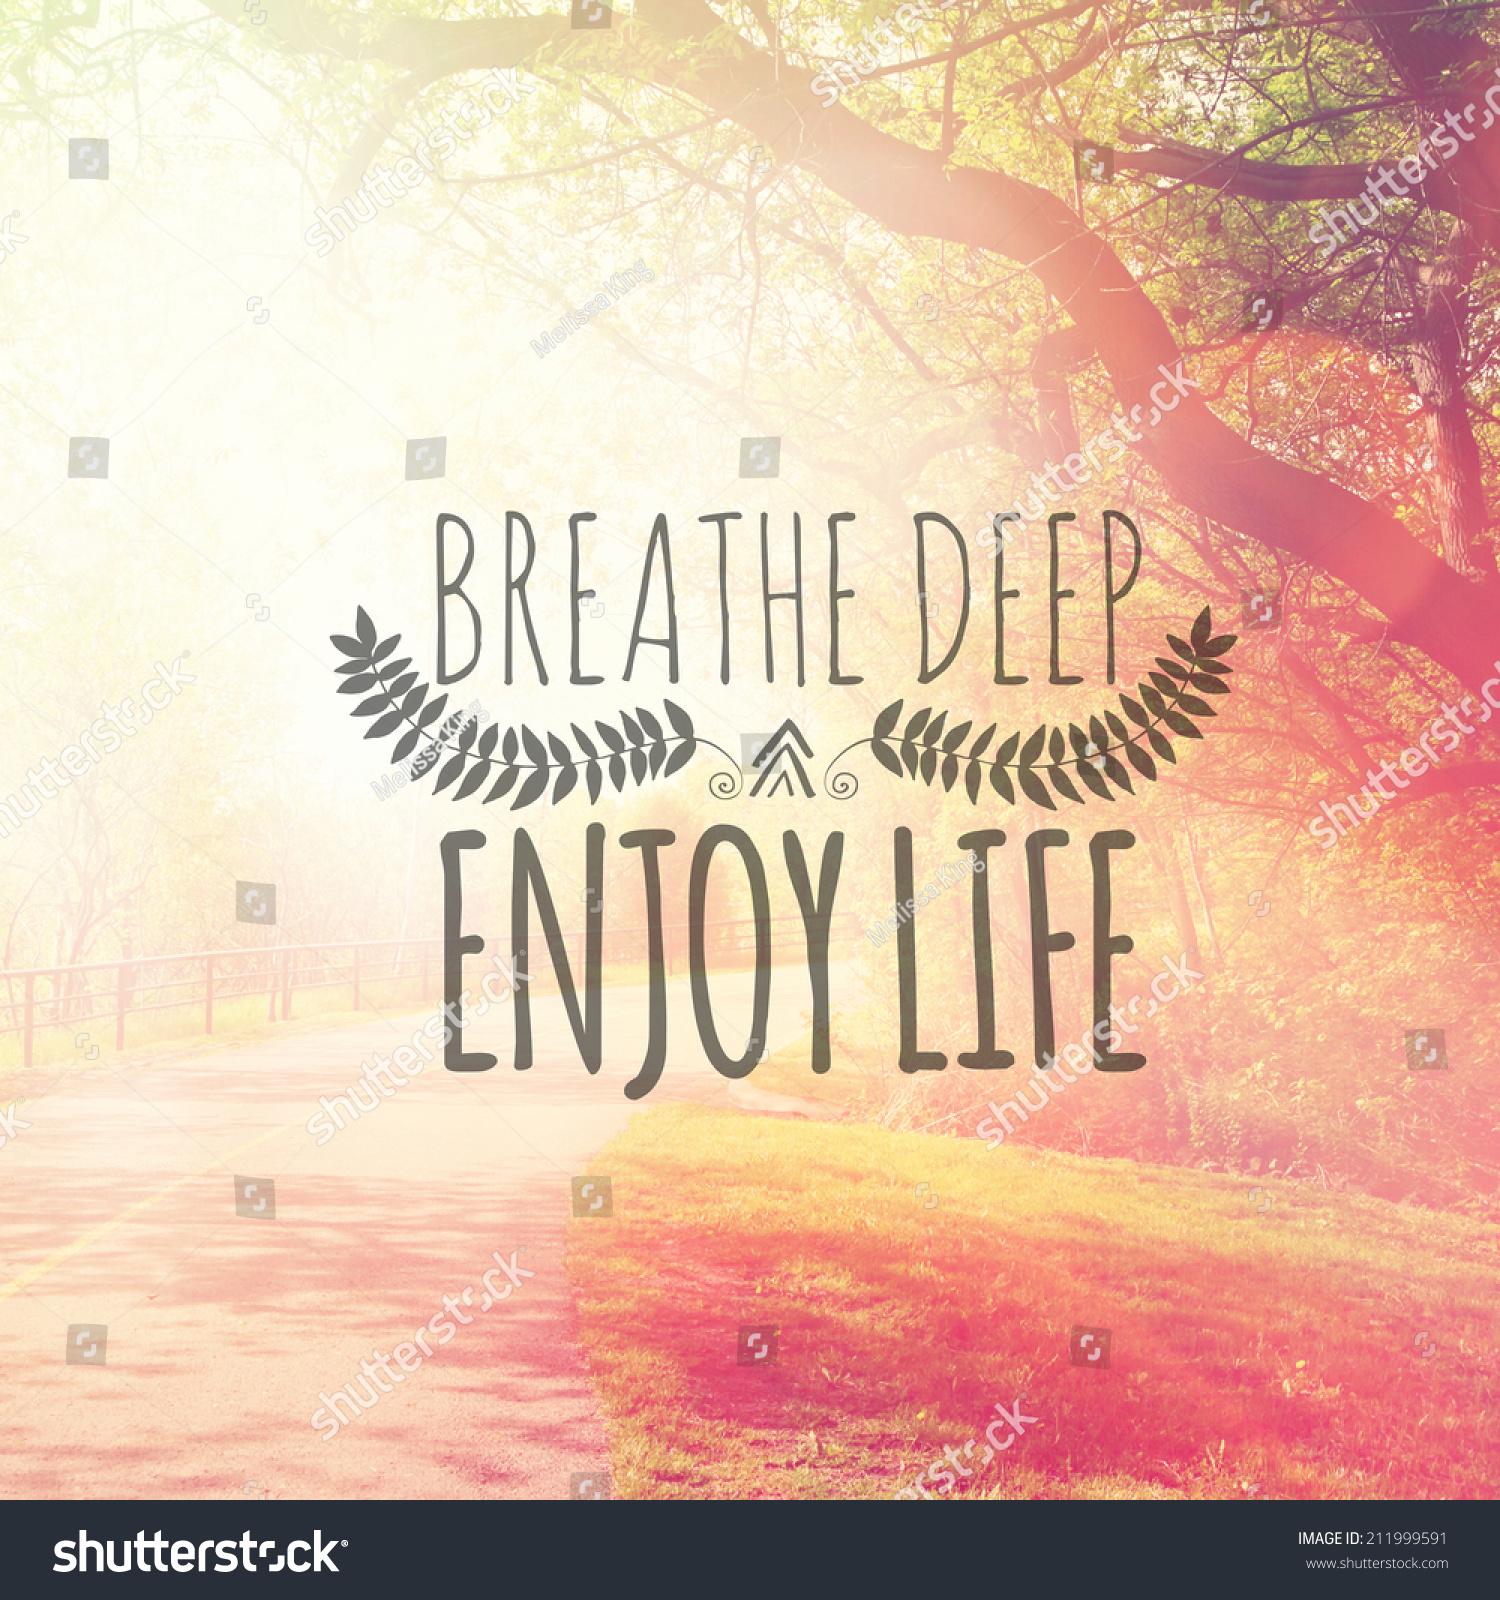 Deep Quotes About Enjoying Life